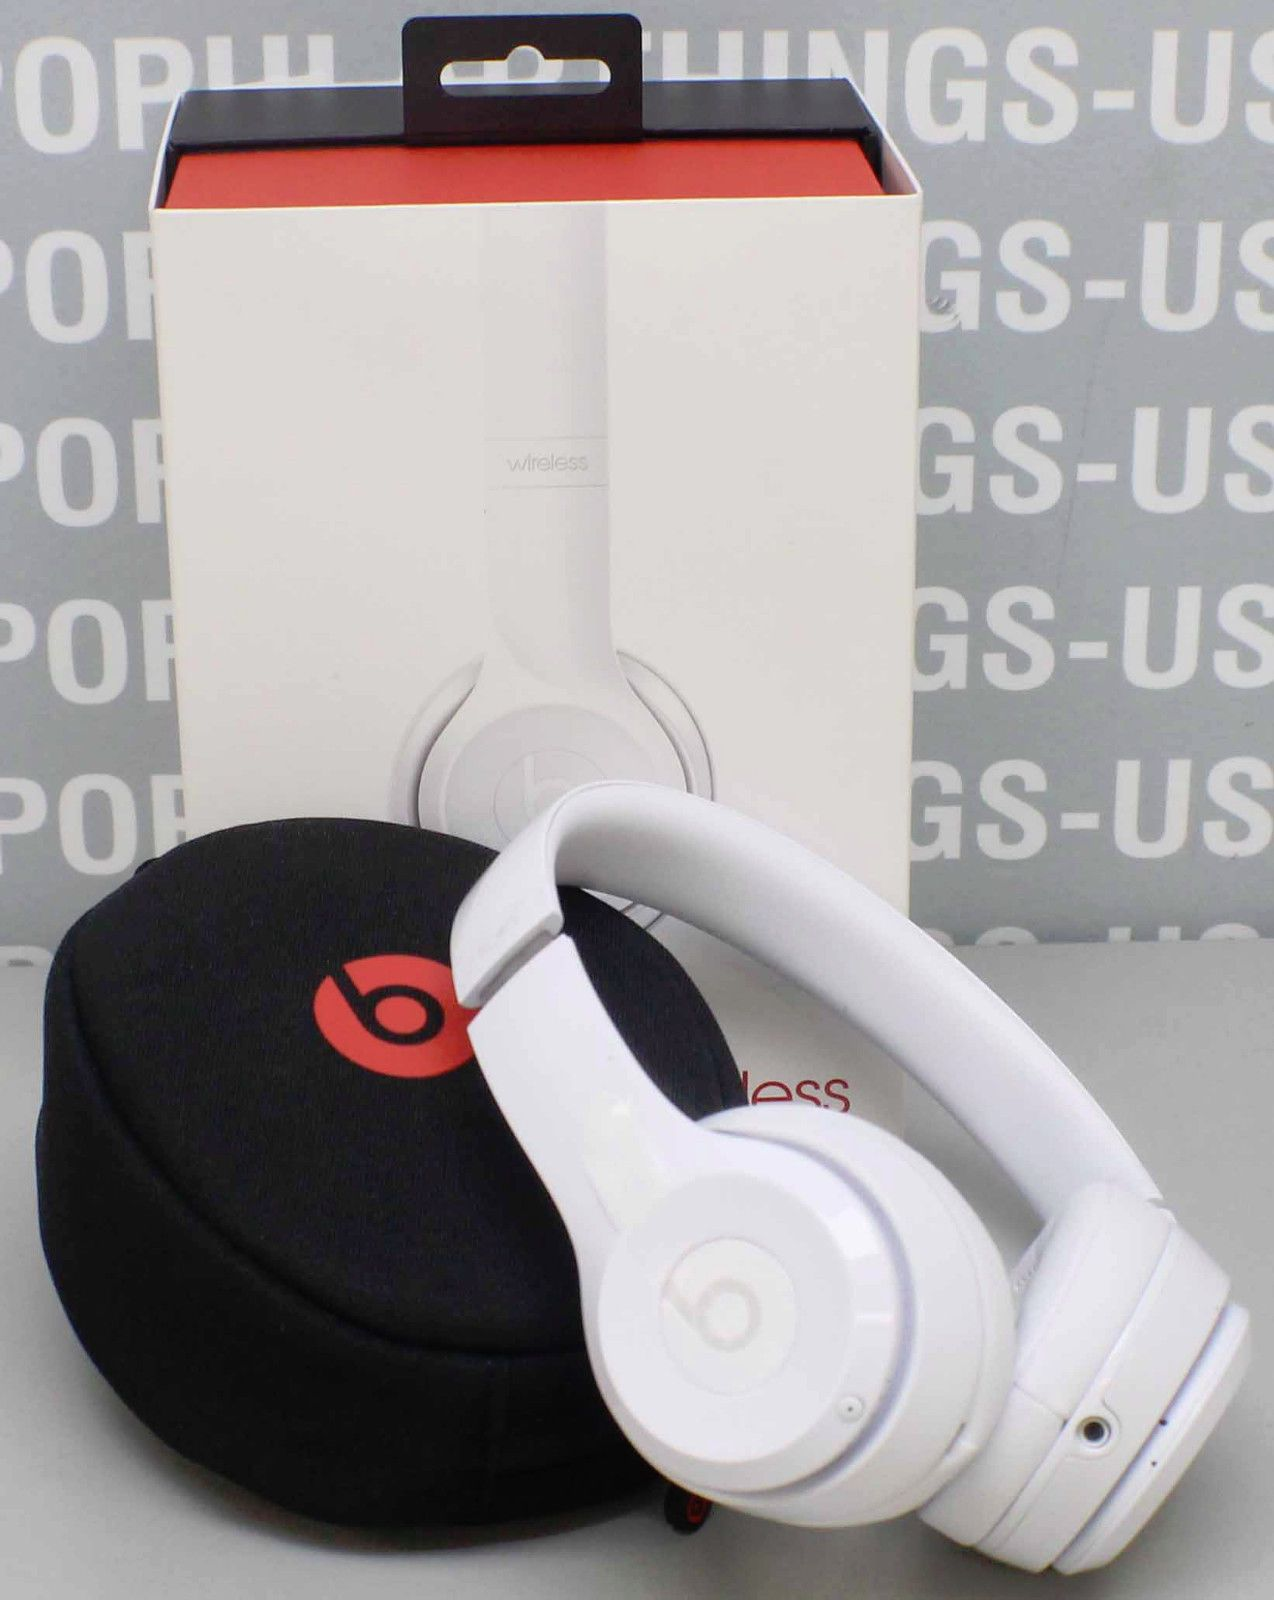 Clean/Working Beats by Dr Dre Solo3 Wireless Headband Headphones in White https://t.co/jTrowiZ9Pf https://t.co/yX7a9iJ4OH